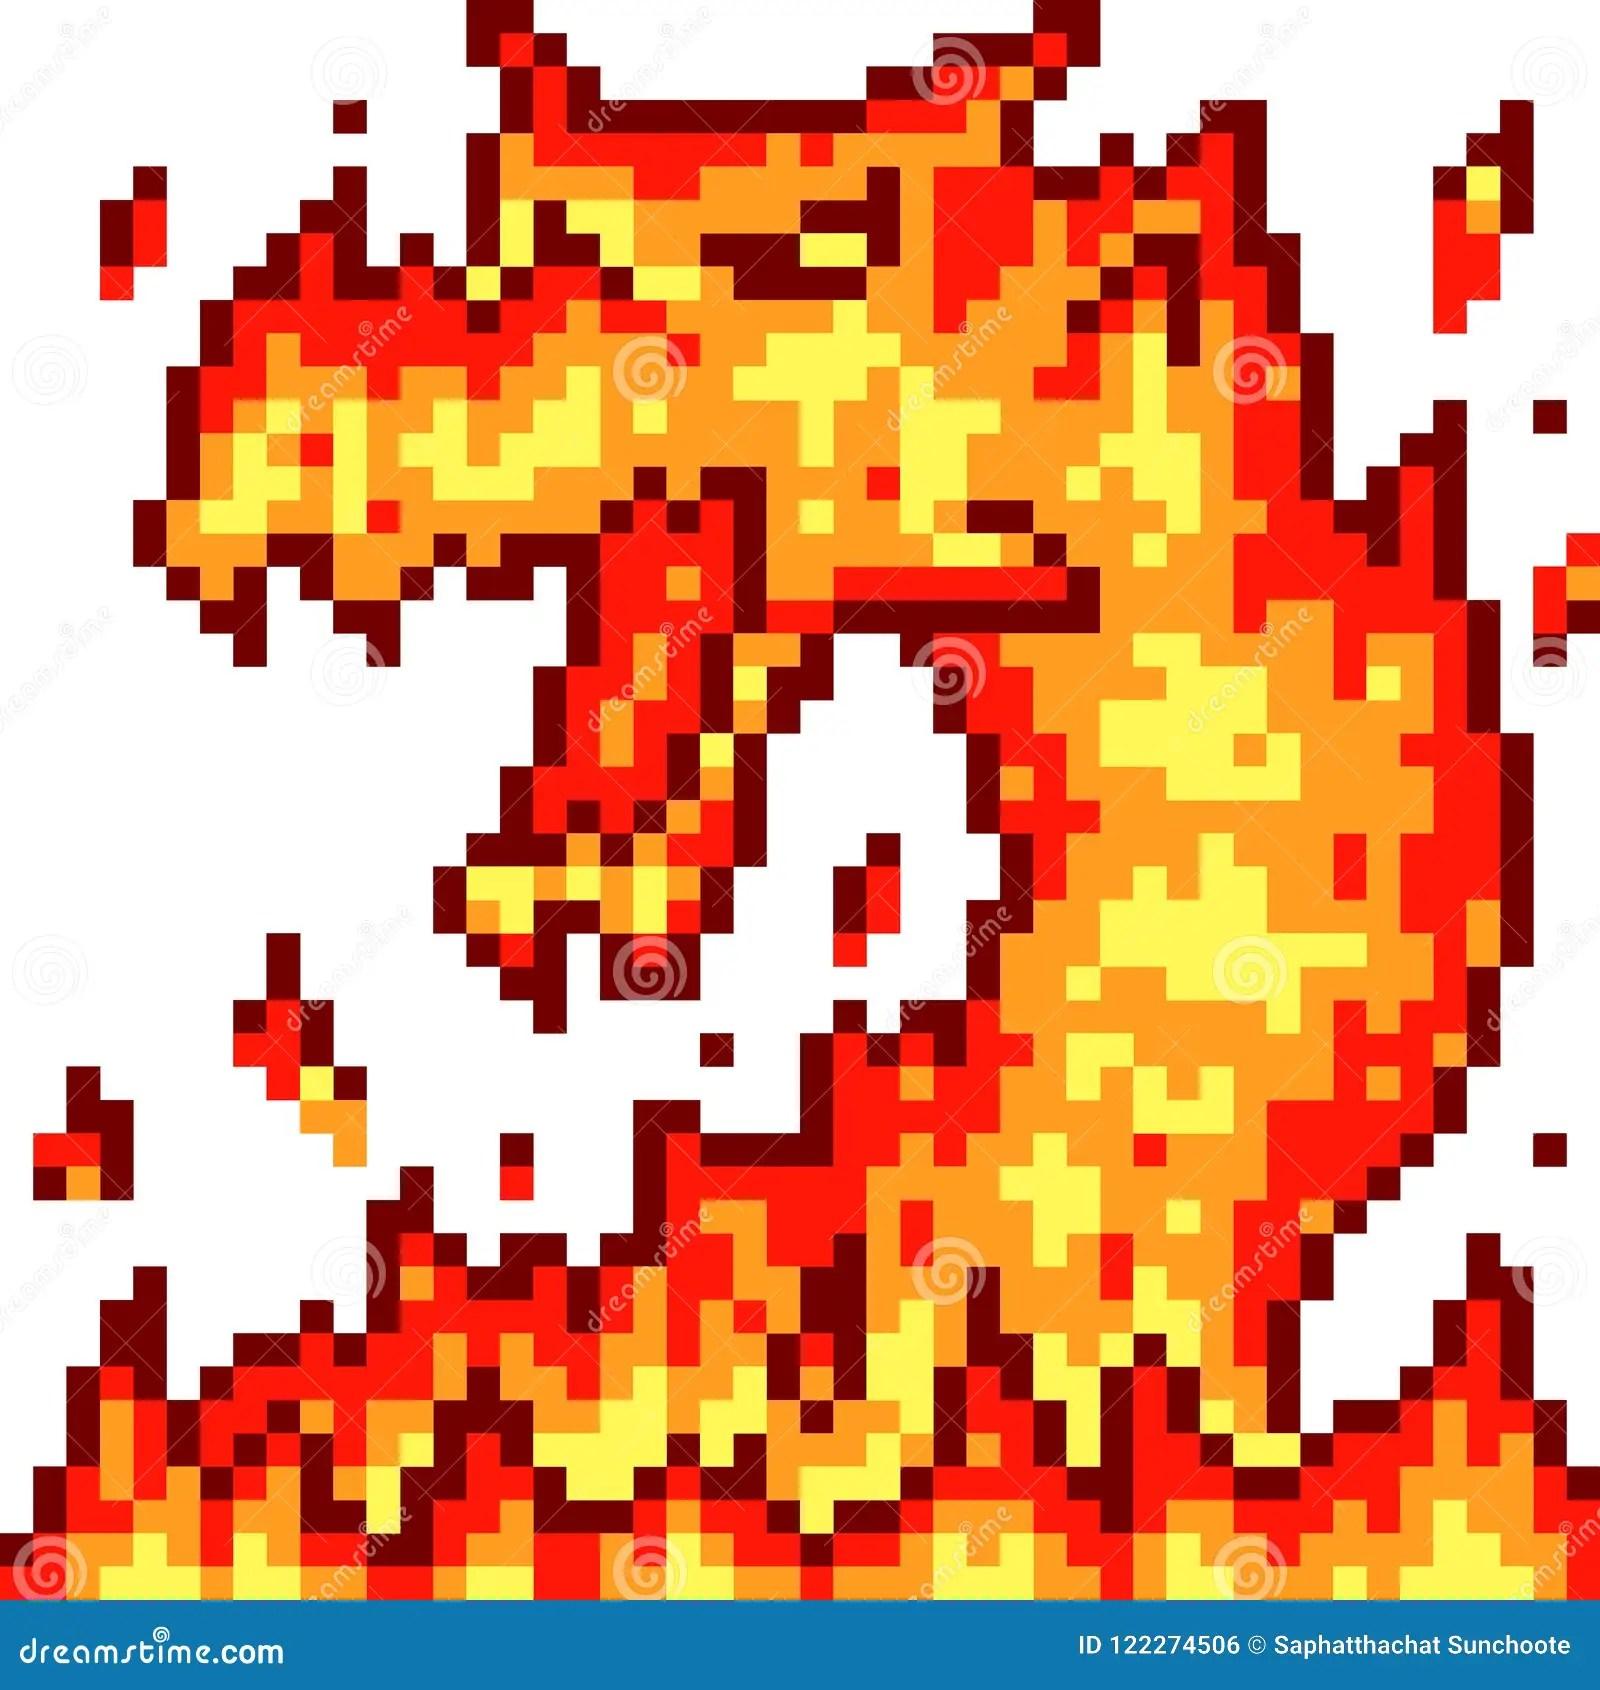 Vector Pixel Art Fire Dragon Stock Vector Illustration Of Fire Dragon 122274506